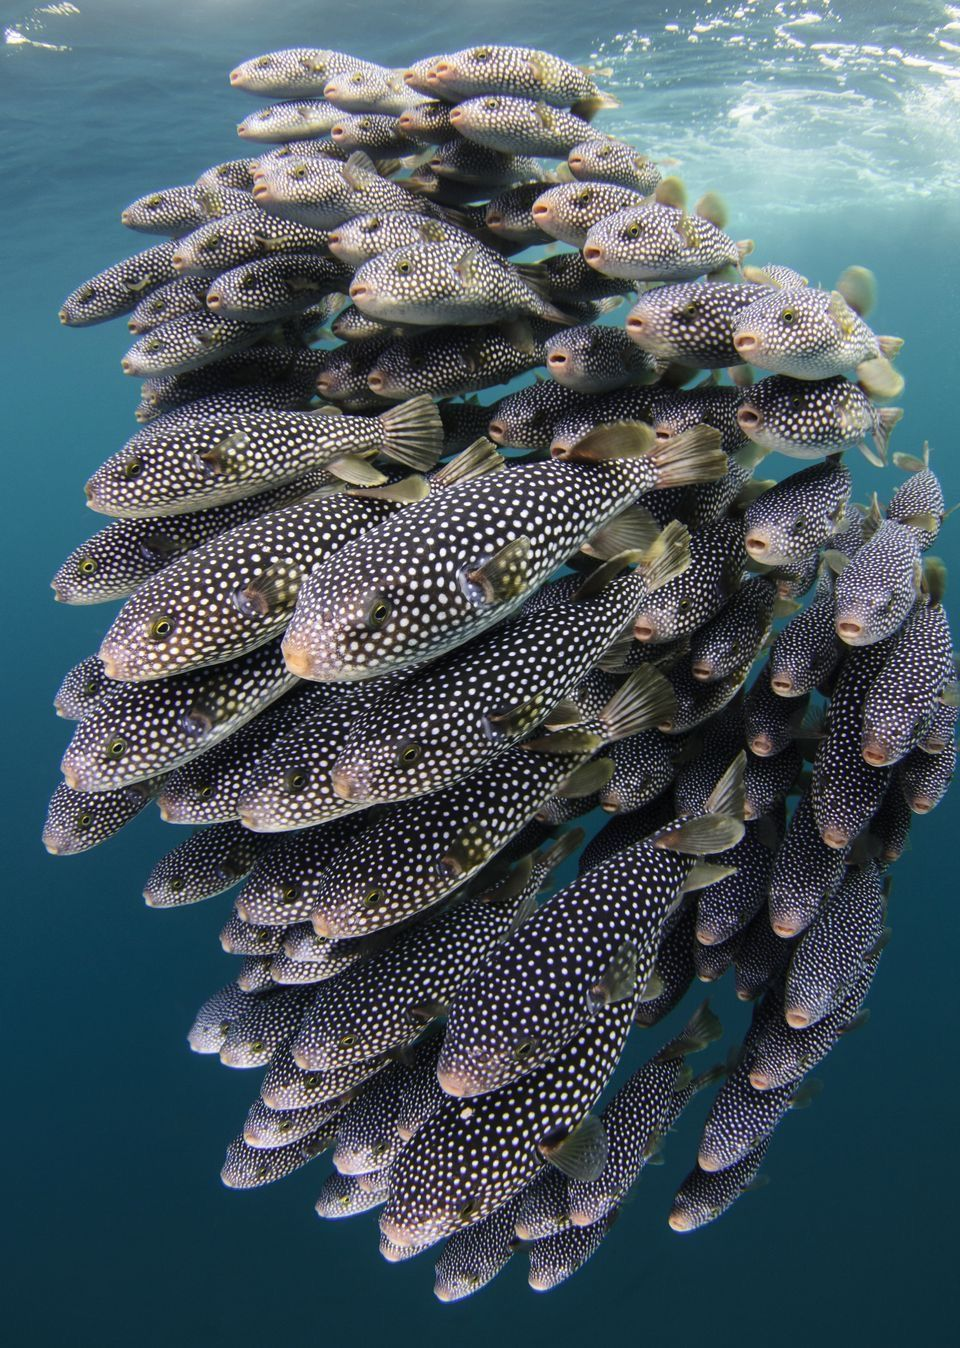 Pin By Ricardo Mora On Oceano Ocean Creatures Sea And Ocean Ocean Animals